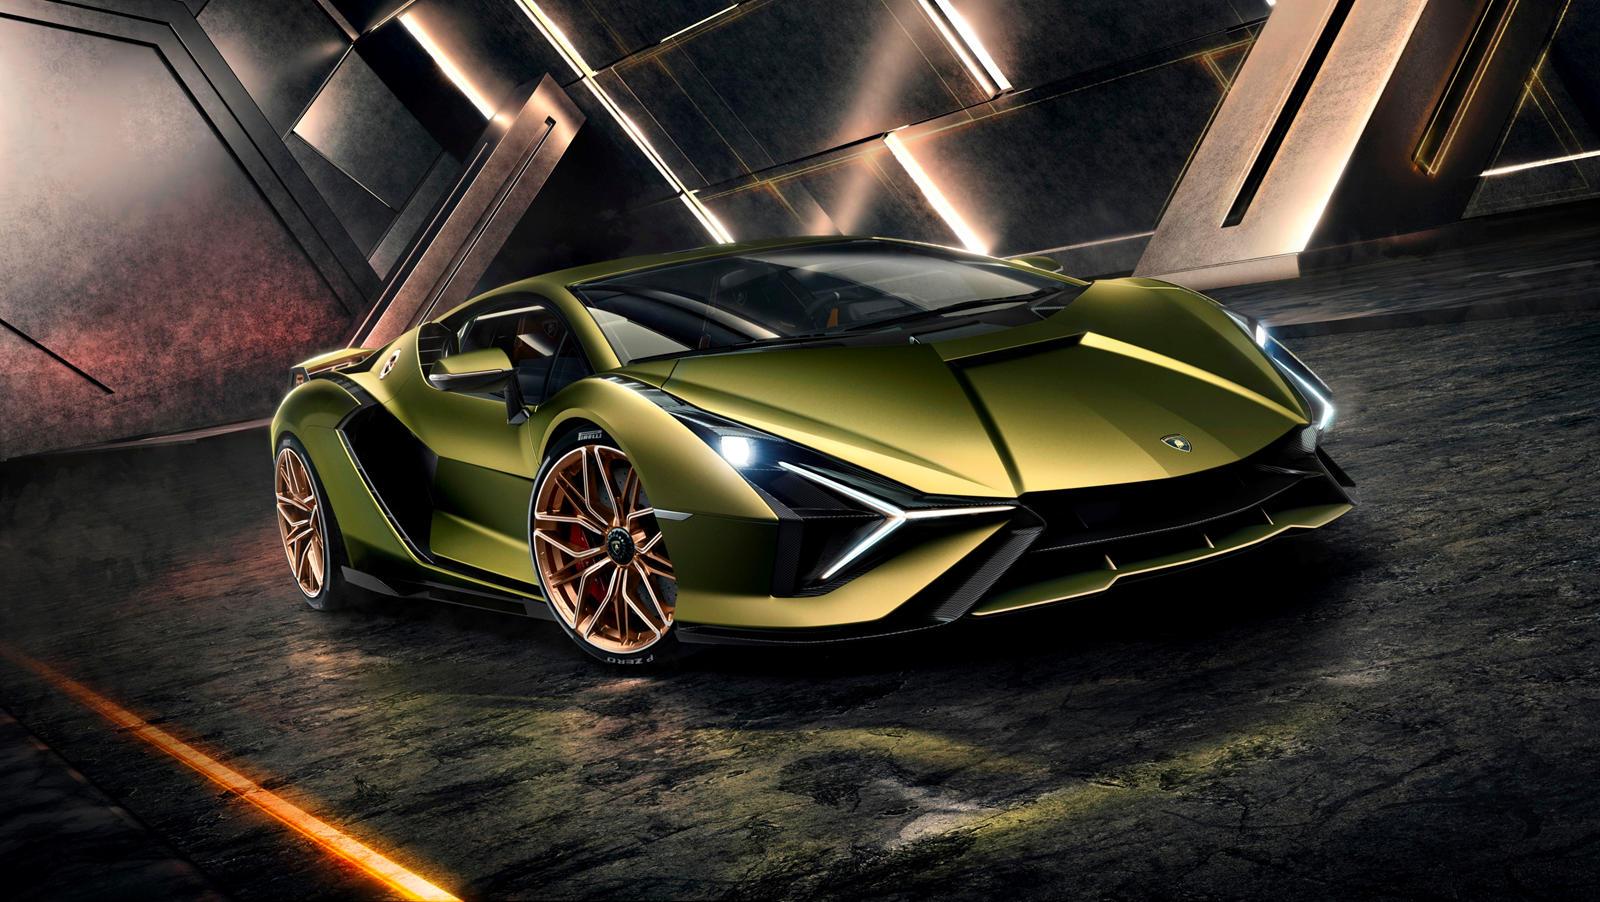 Lamborghini Sian Review Trims Specs Price New Interior Features Exterior Design And Specifications Carbuzz